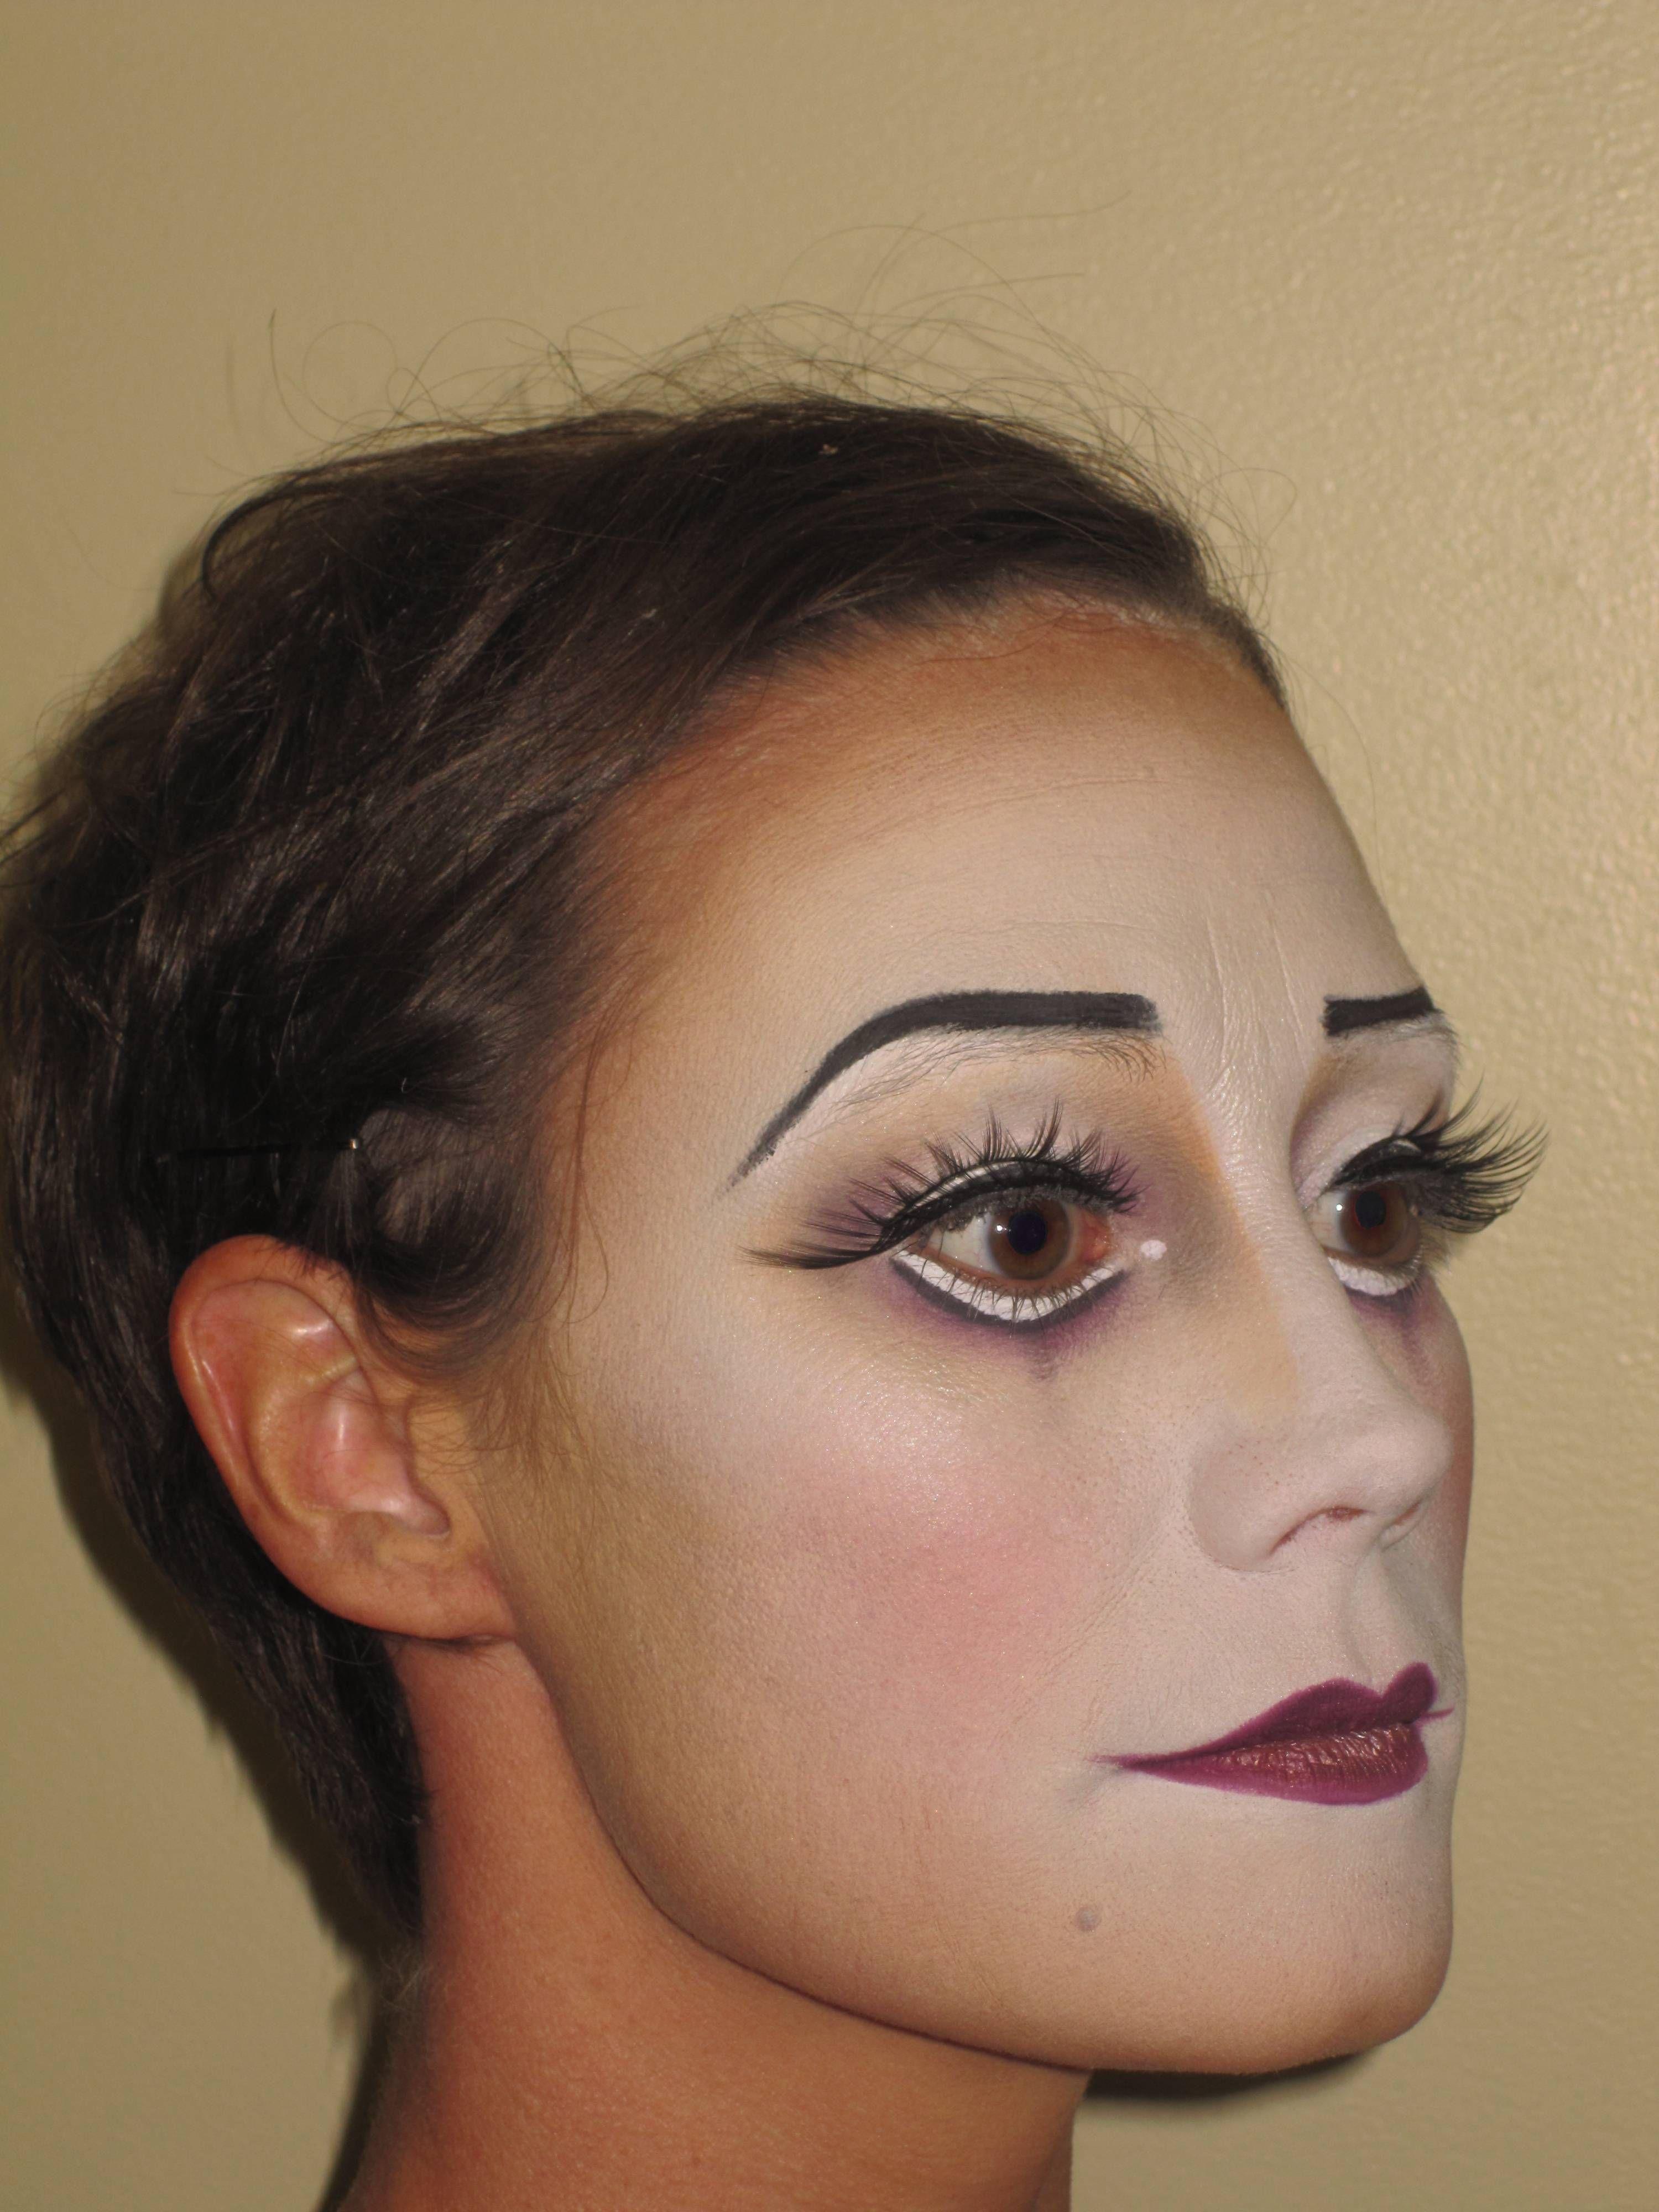 cirque du soleil makeup - Google Search #theatricalmakeup